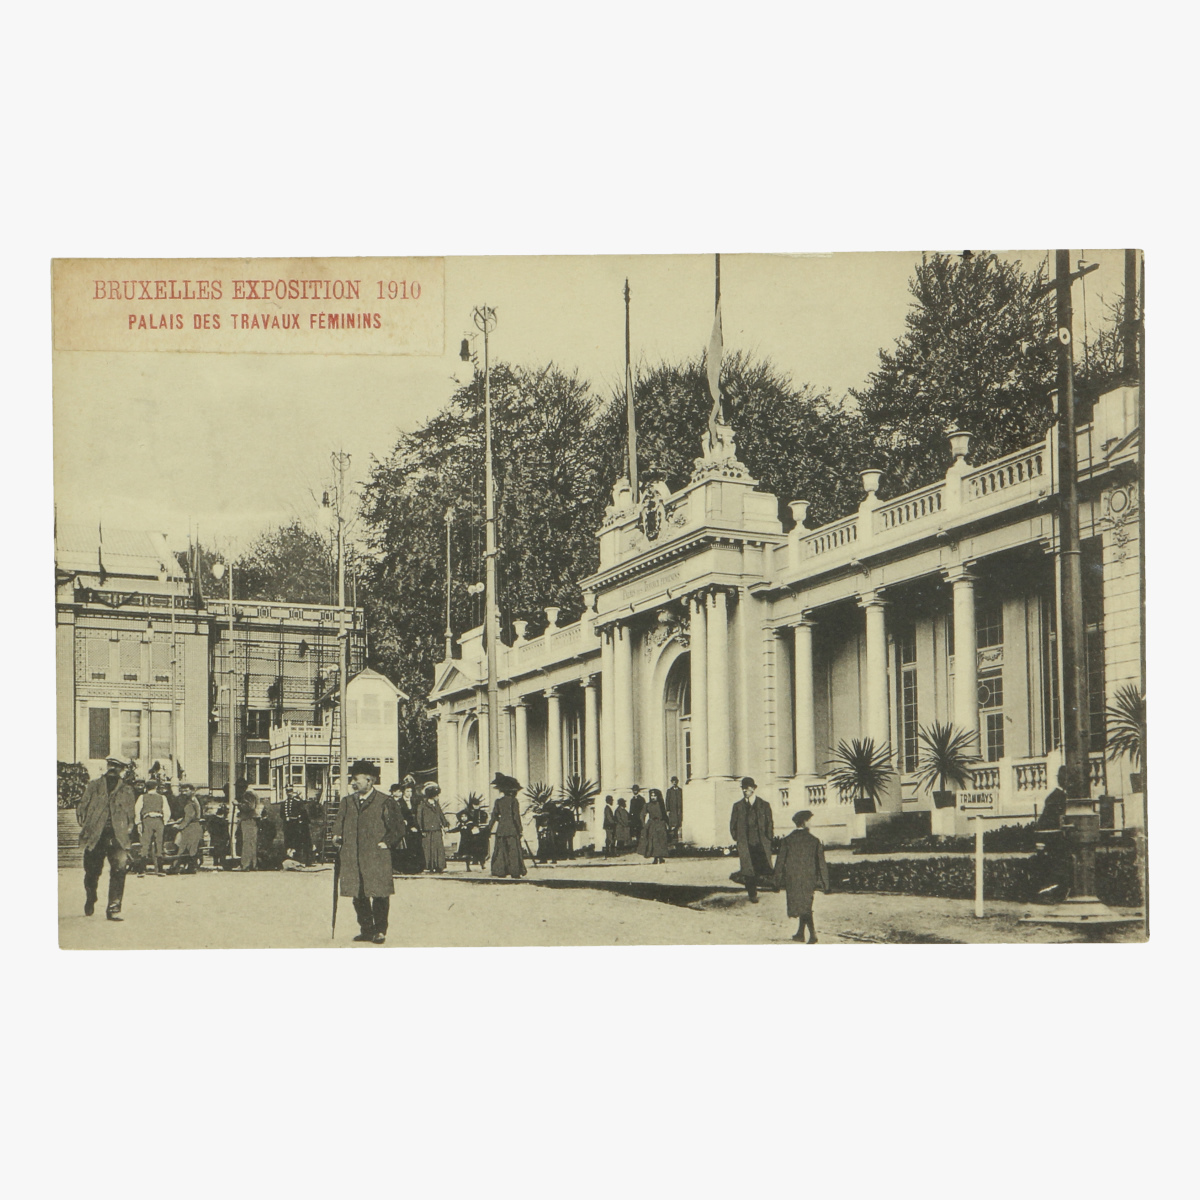 Afbeeldingen van postkaart bruxelles exposition 1910 palais des tavaux femimins